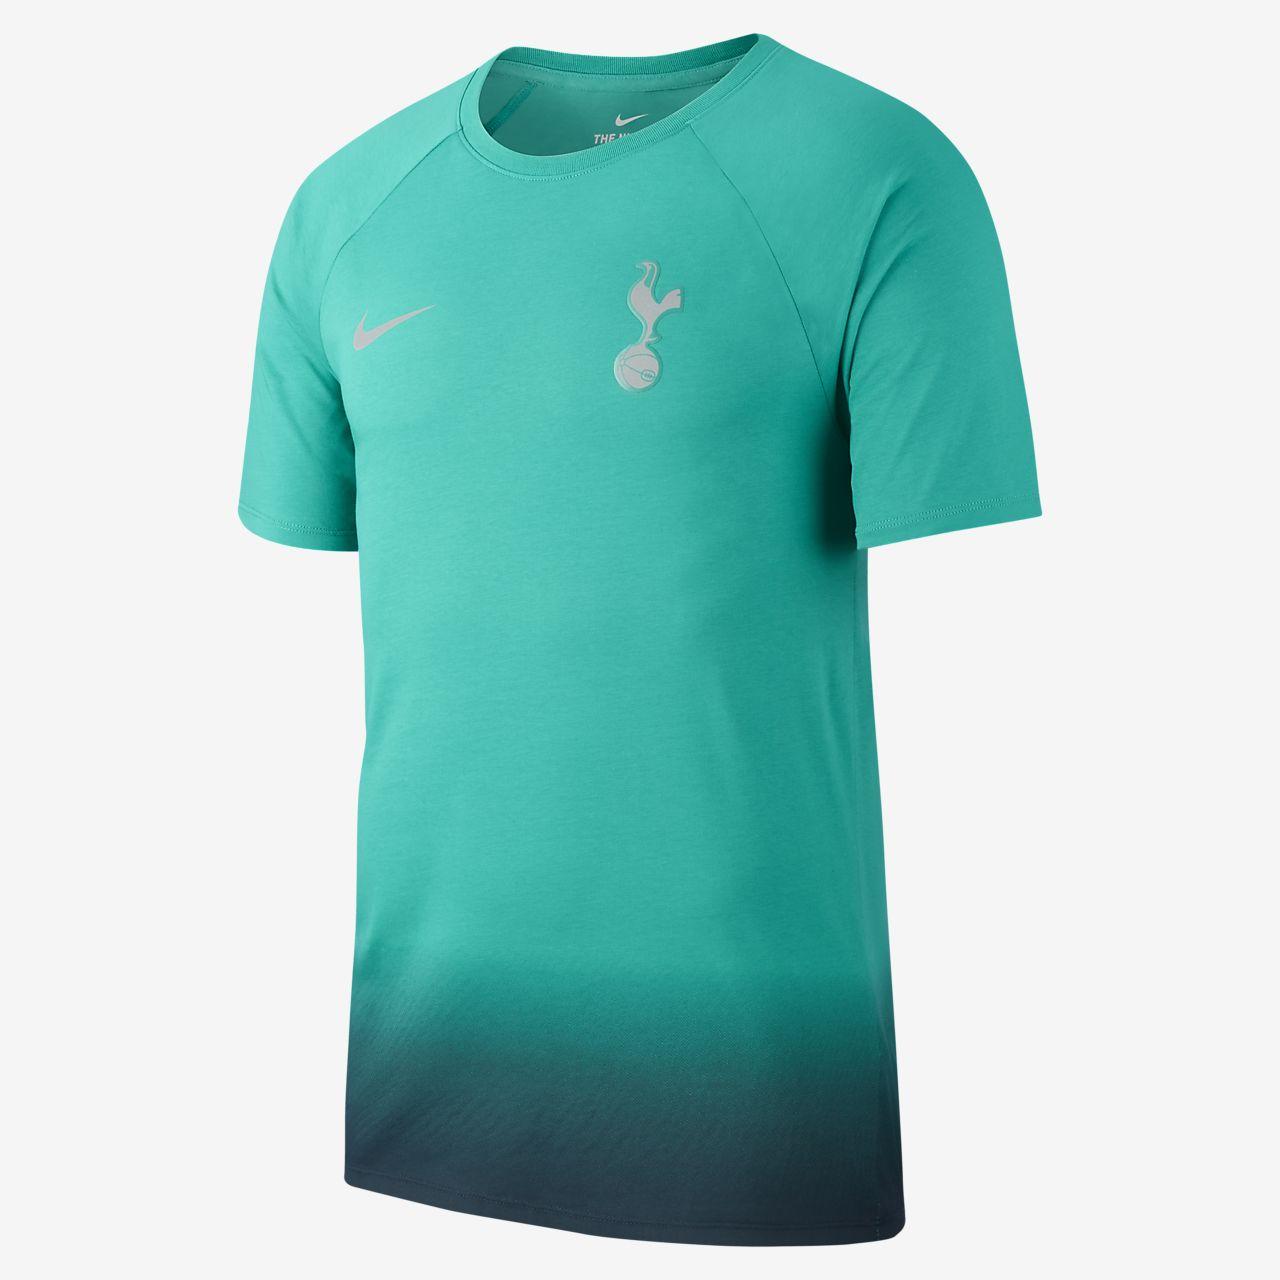 ... Playera para hombre Tottenham Hotspur FC Dri-FIT Match Polera Deportiva  Dry ... 6bb29f1ed4274